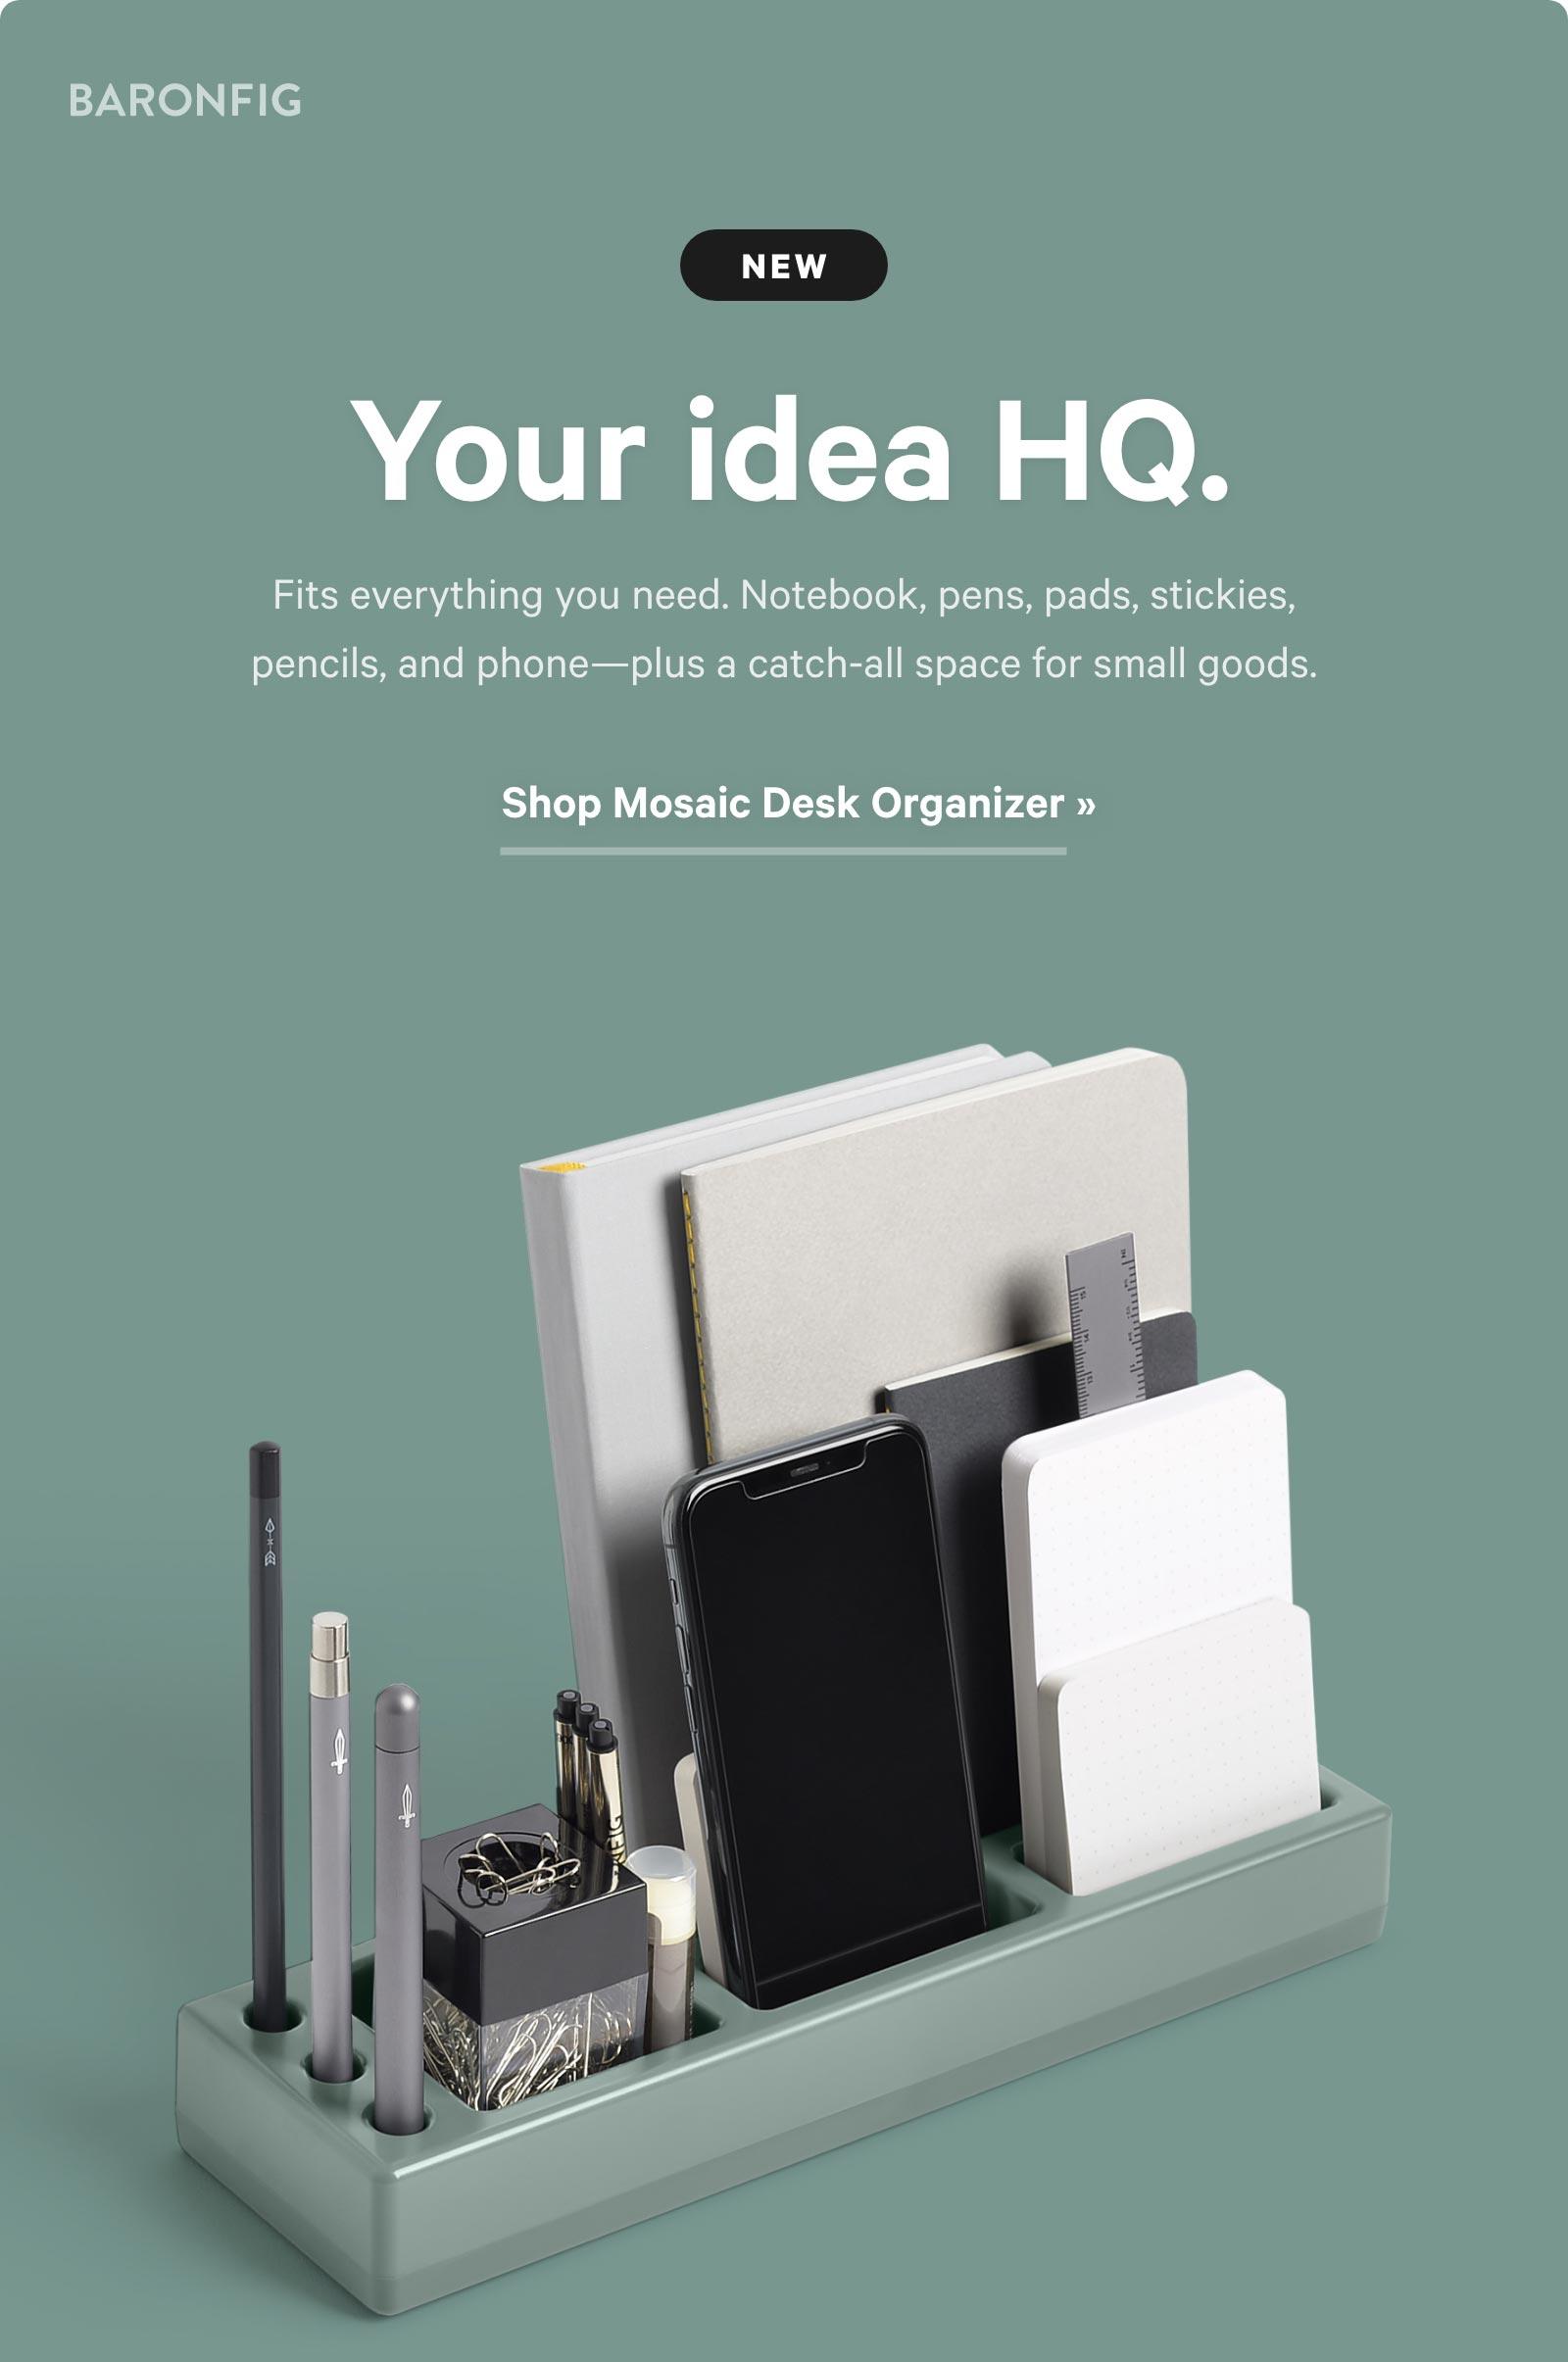 Your idea HQ. Shop Mosaic Desk Organizer ?